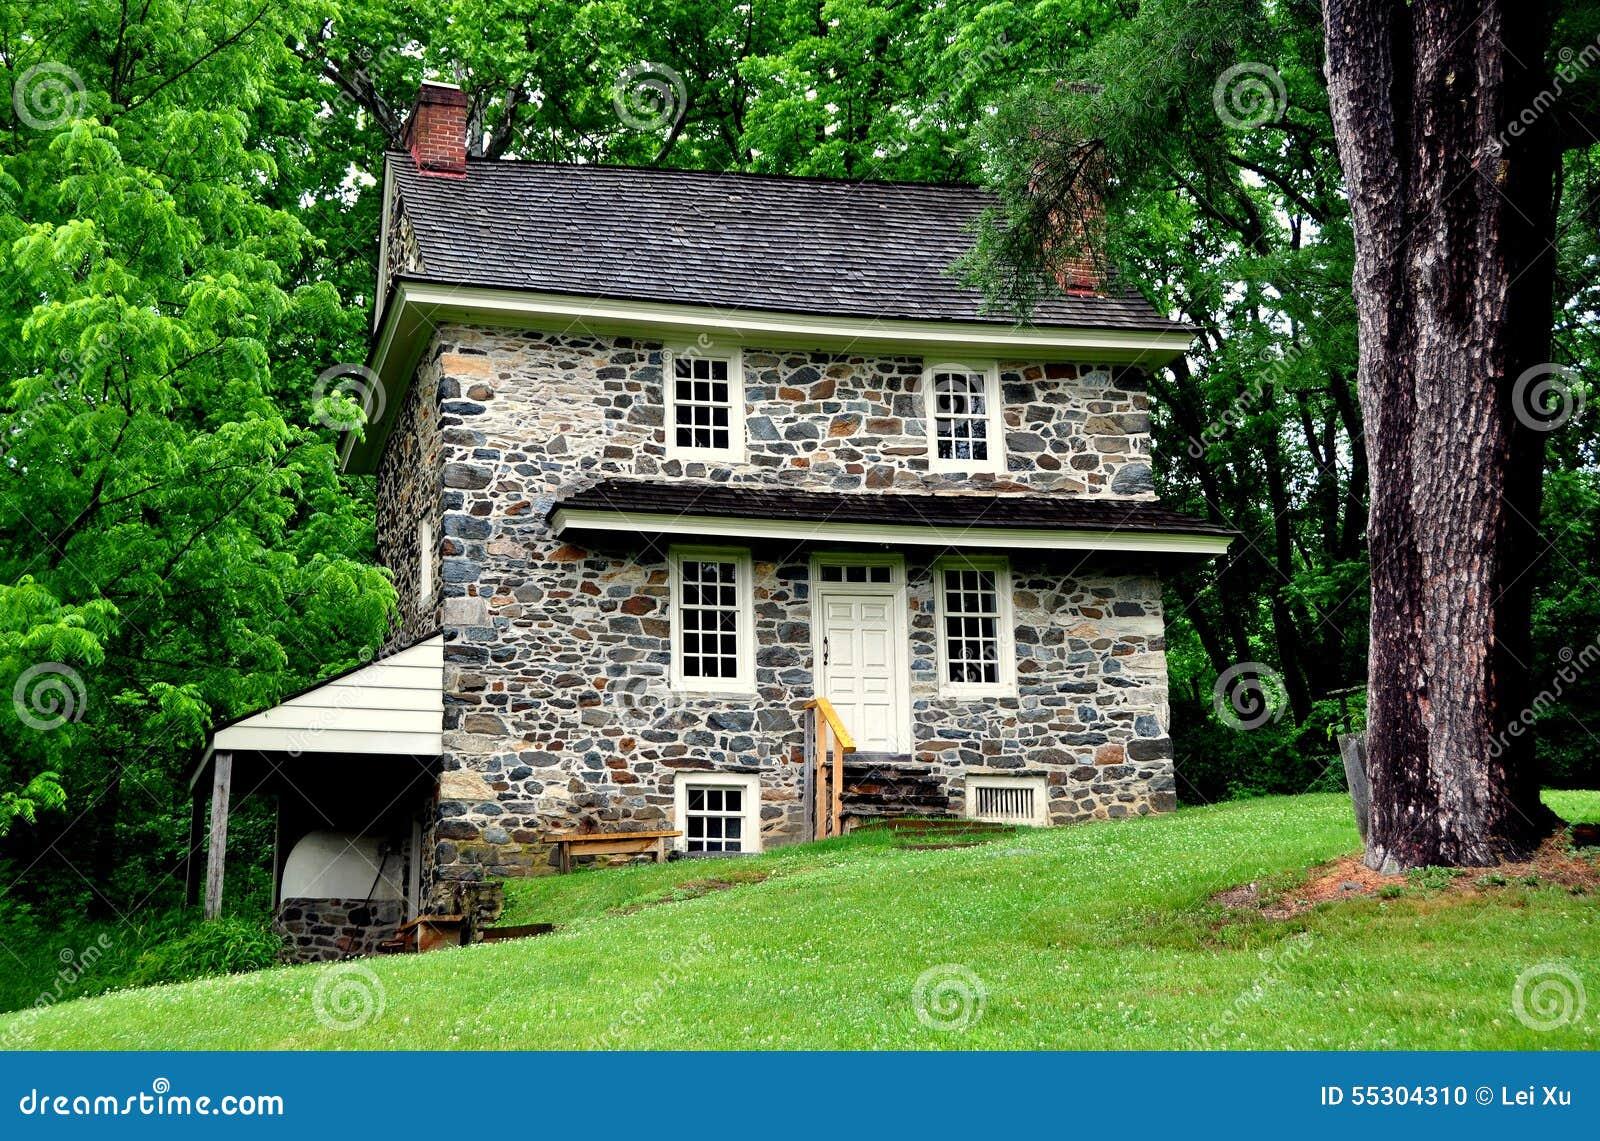 Fieldstone house plan - House interior